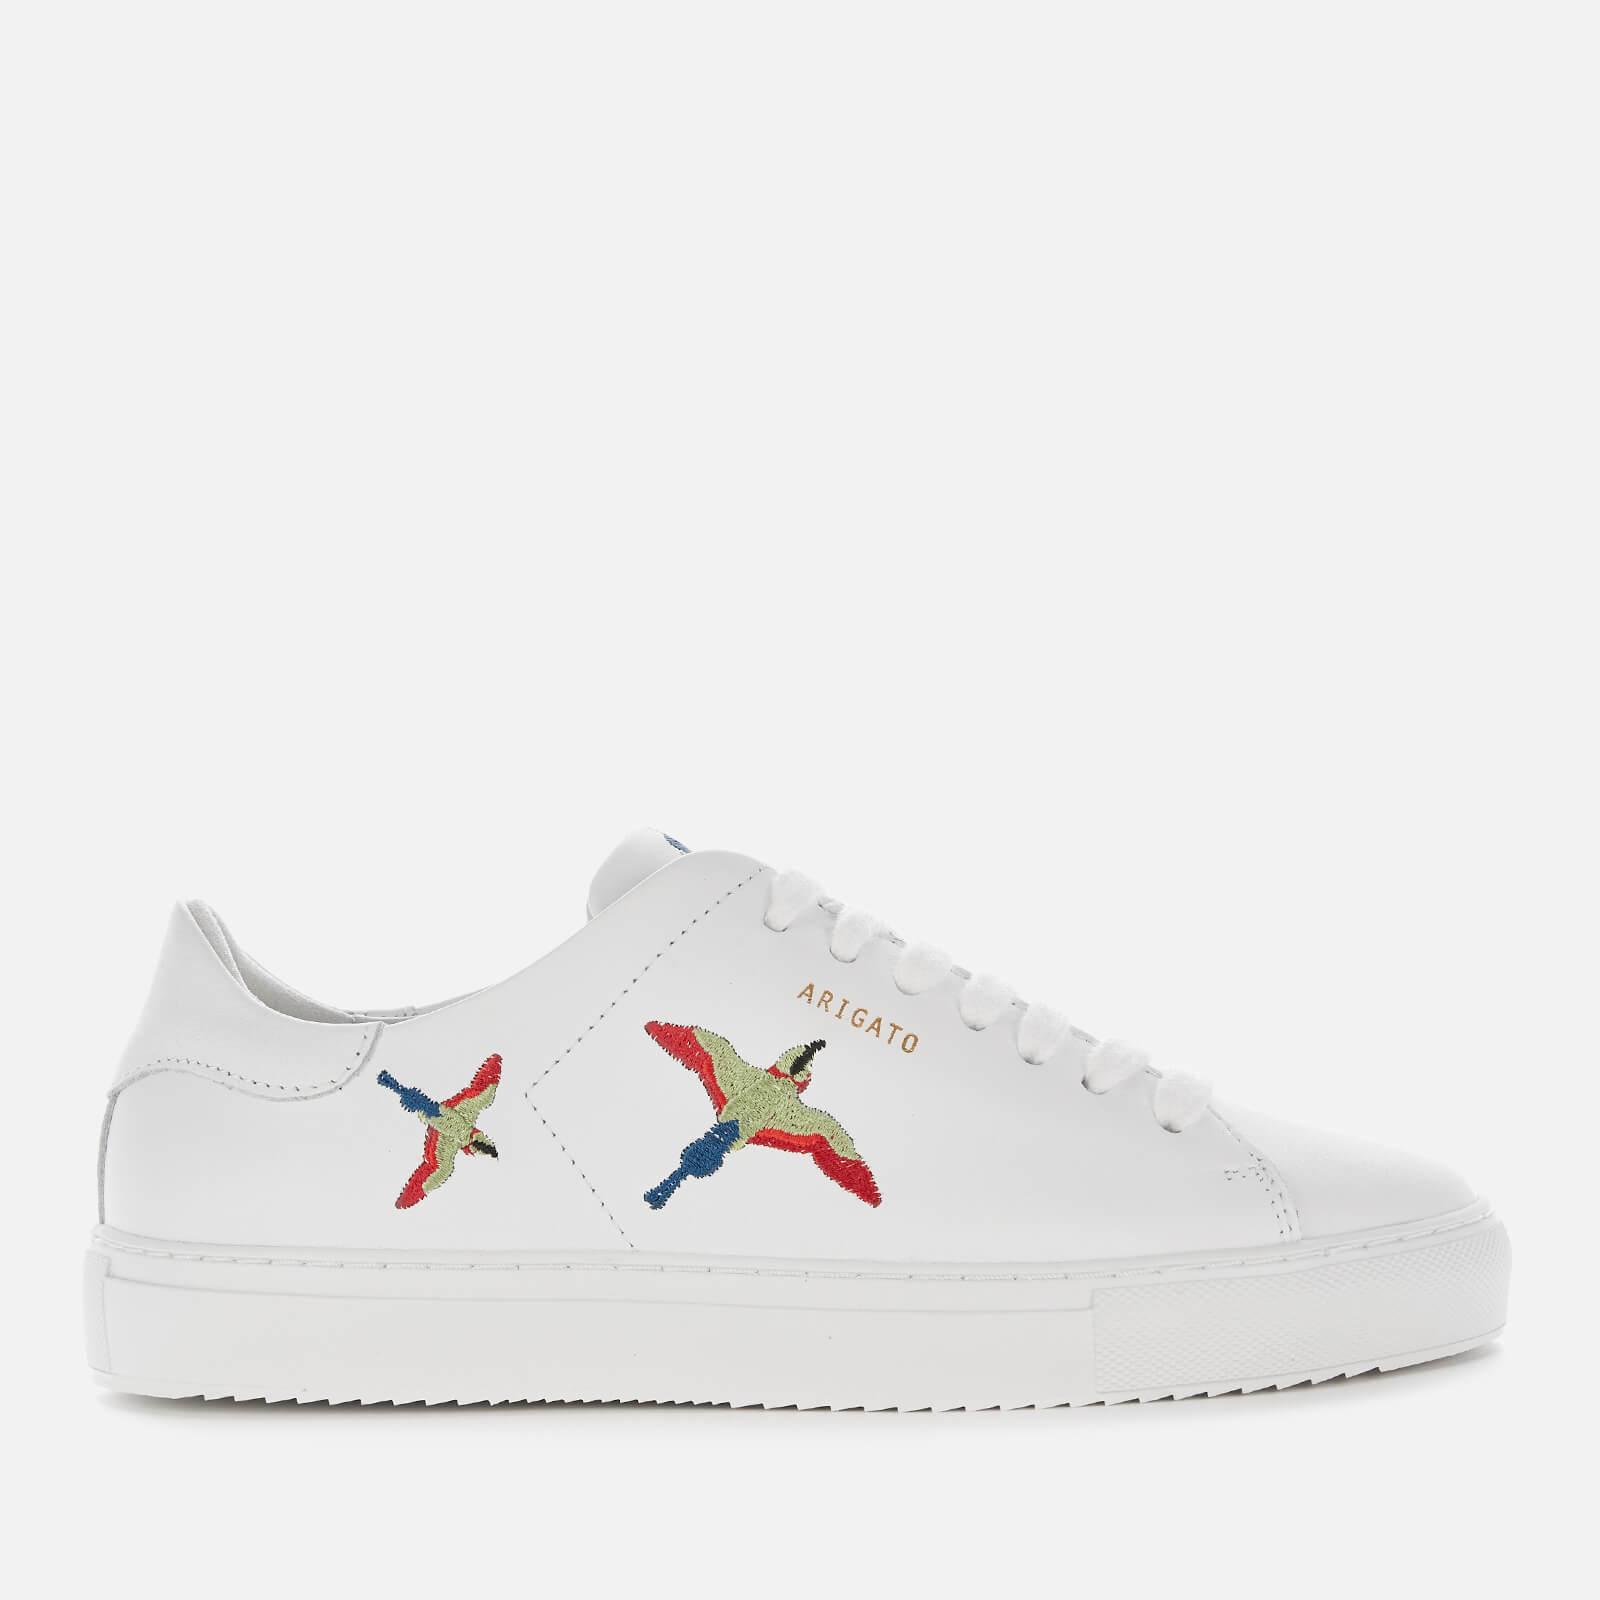 Axel Arigato Clean 90 飞鸟运动鞋